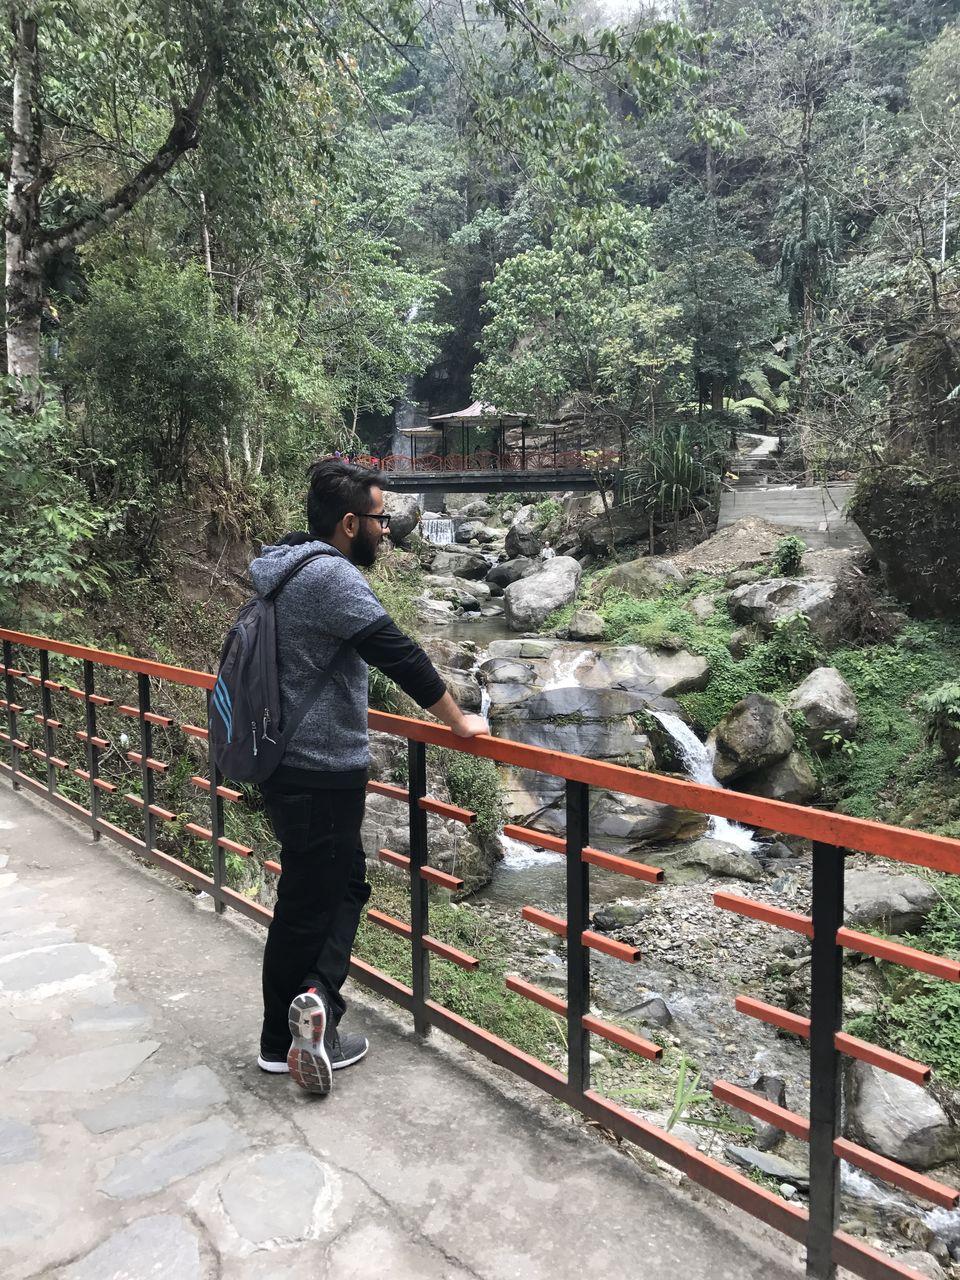 Photos of Banjhakri Falls and Park, Gangtok, Sikkim, India 1/1 by Gopish Monga